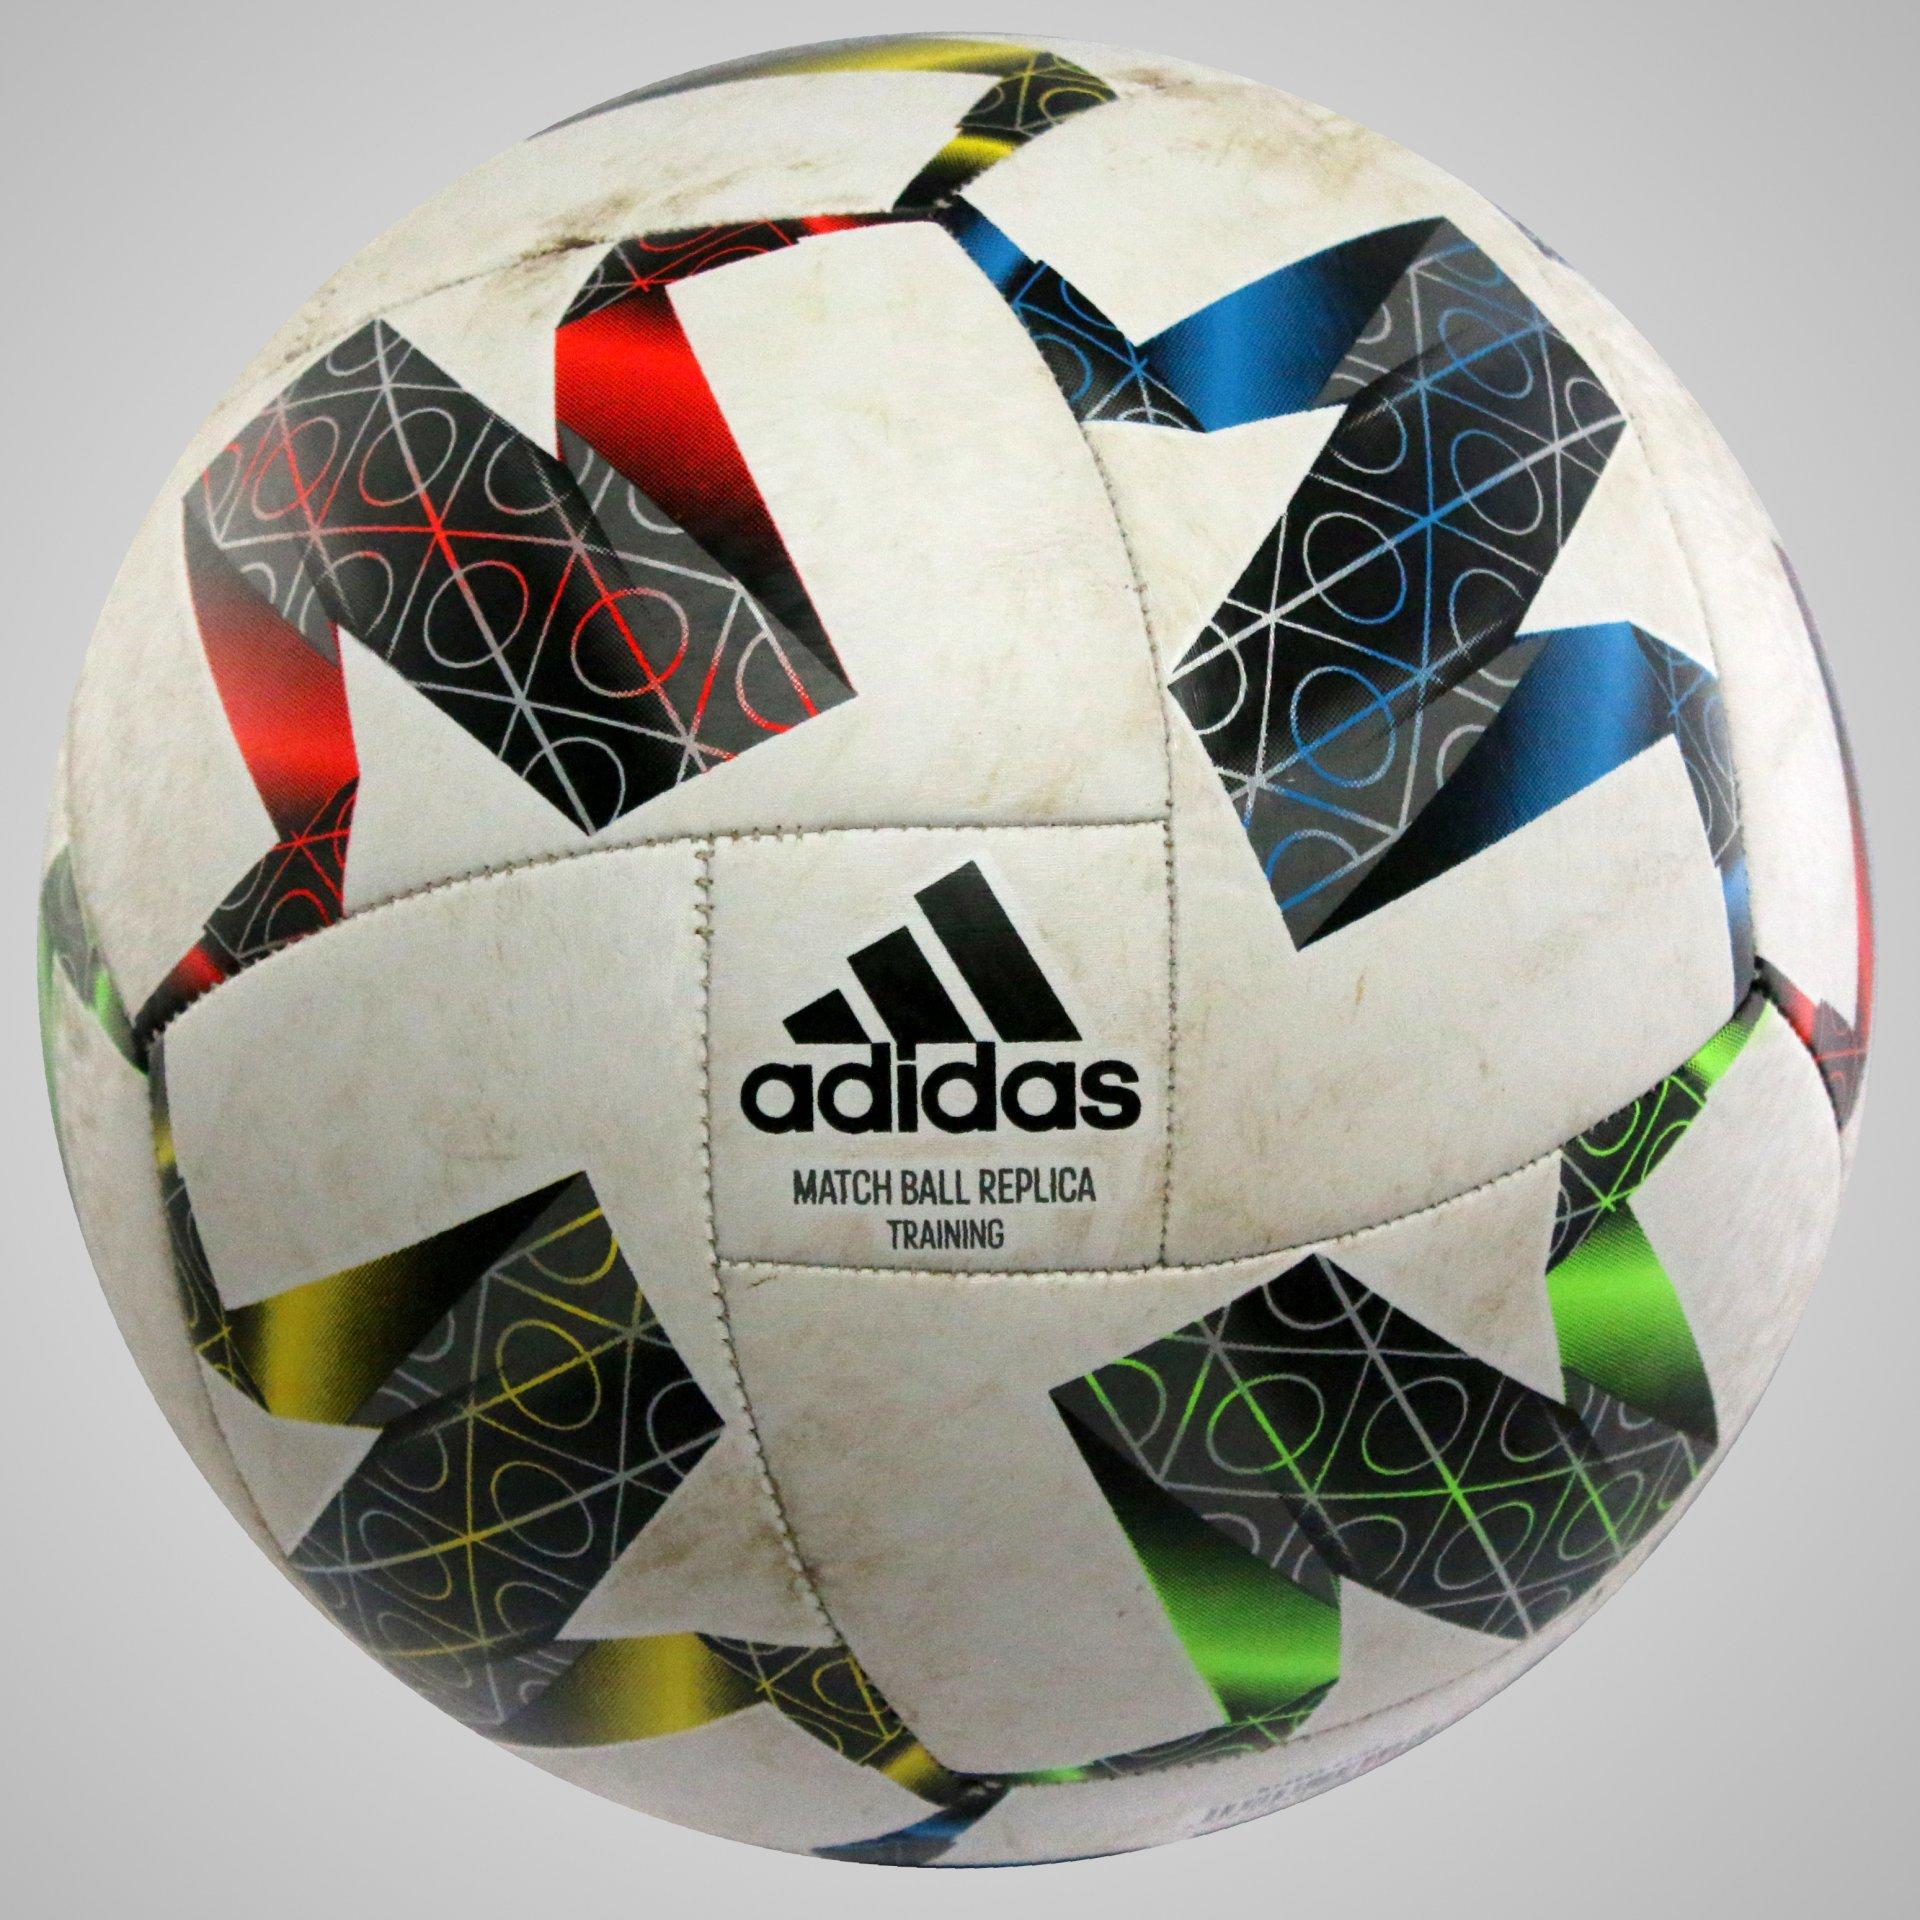 Adidas Nations League 2020 Training TRN